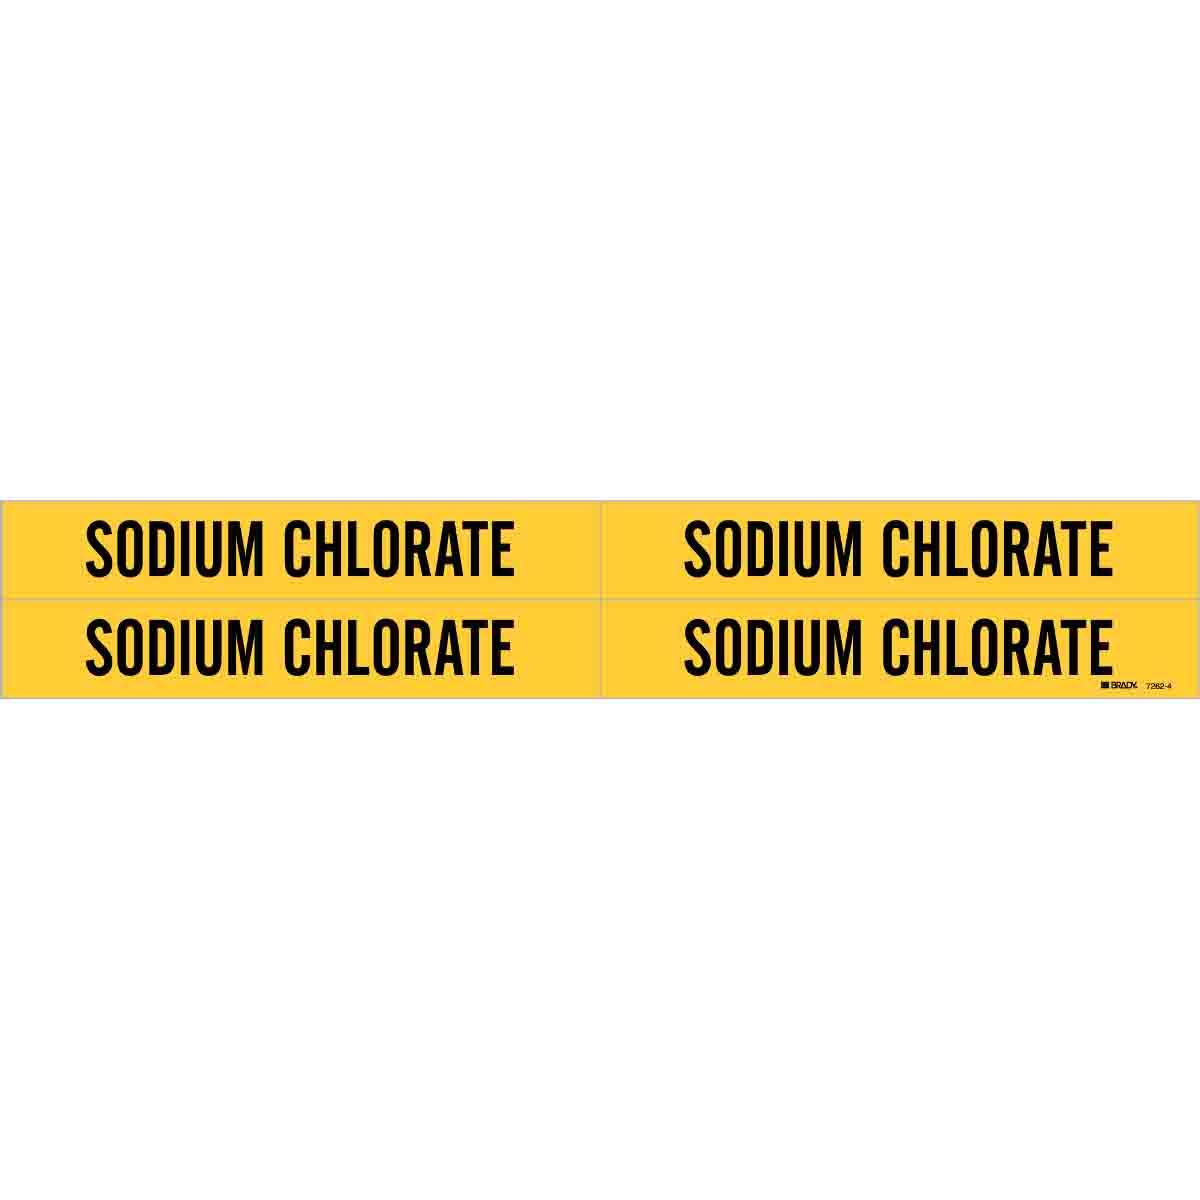 Brady Part 7262 4 91762 Sodium Chlorate Pipe Marker